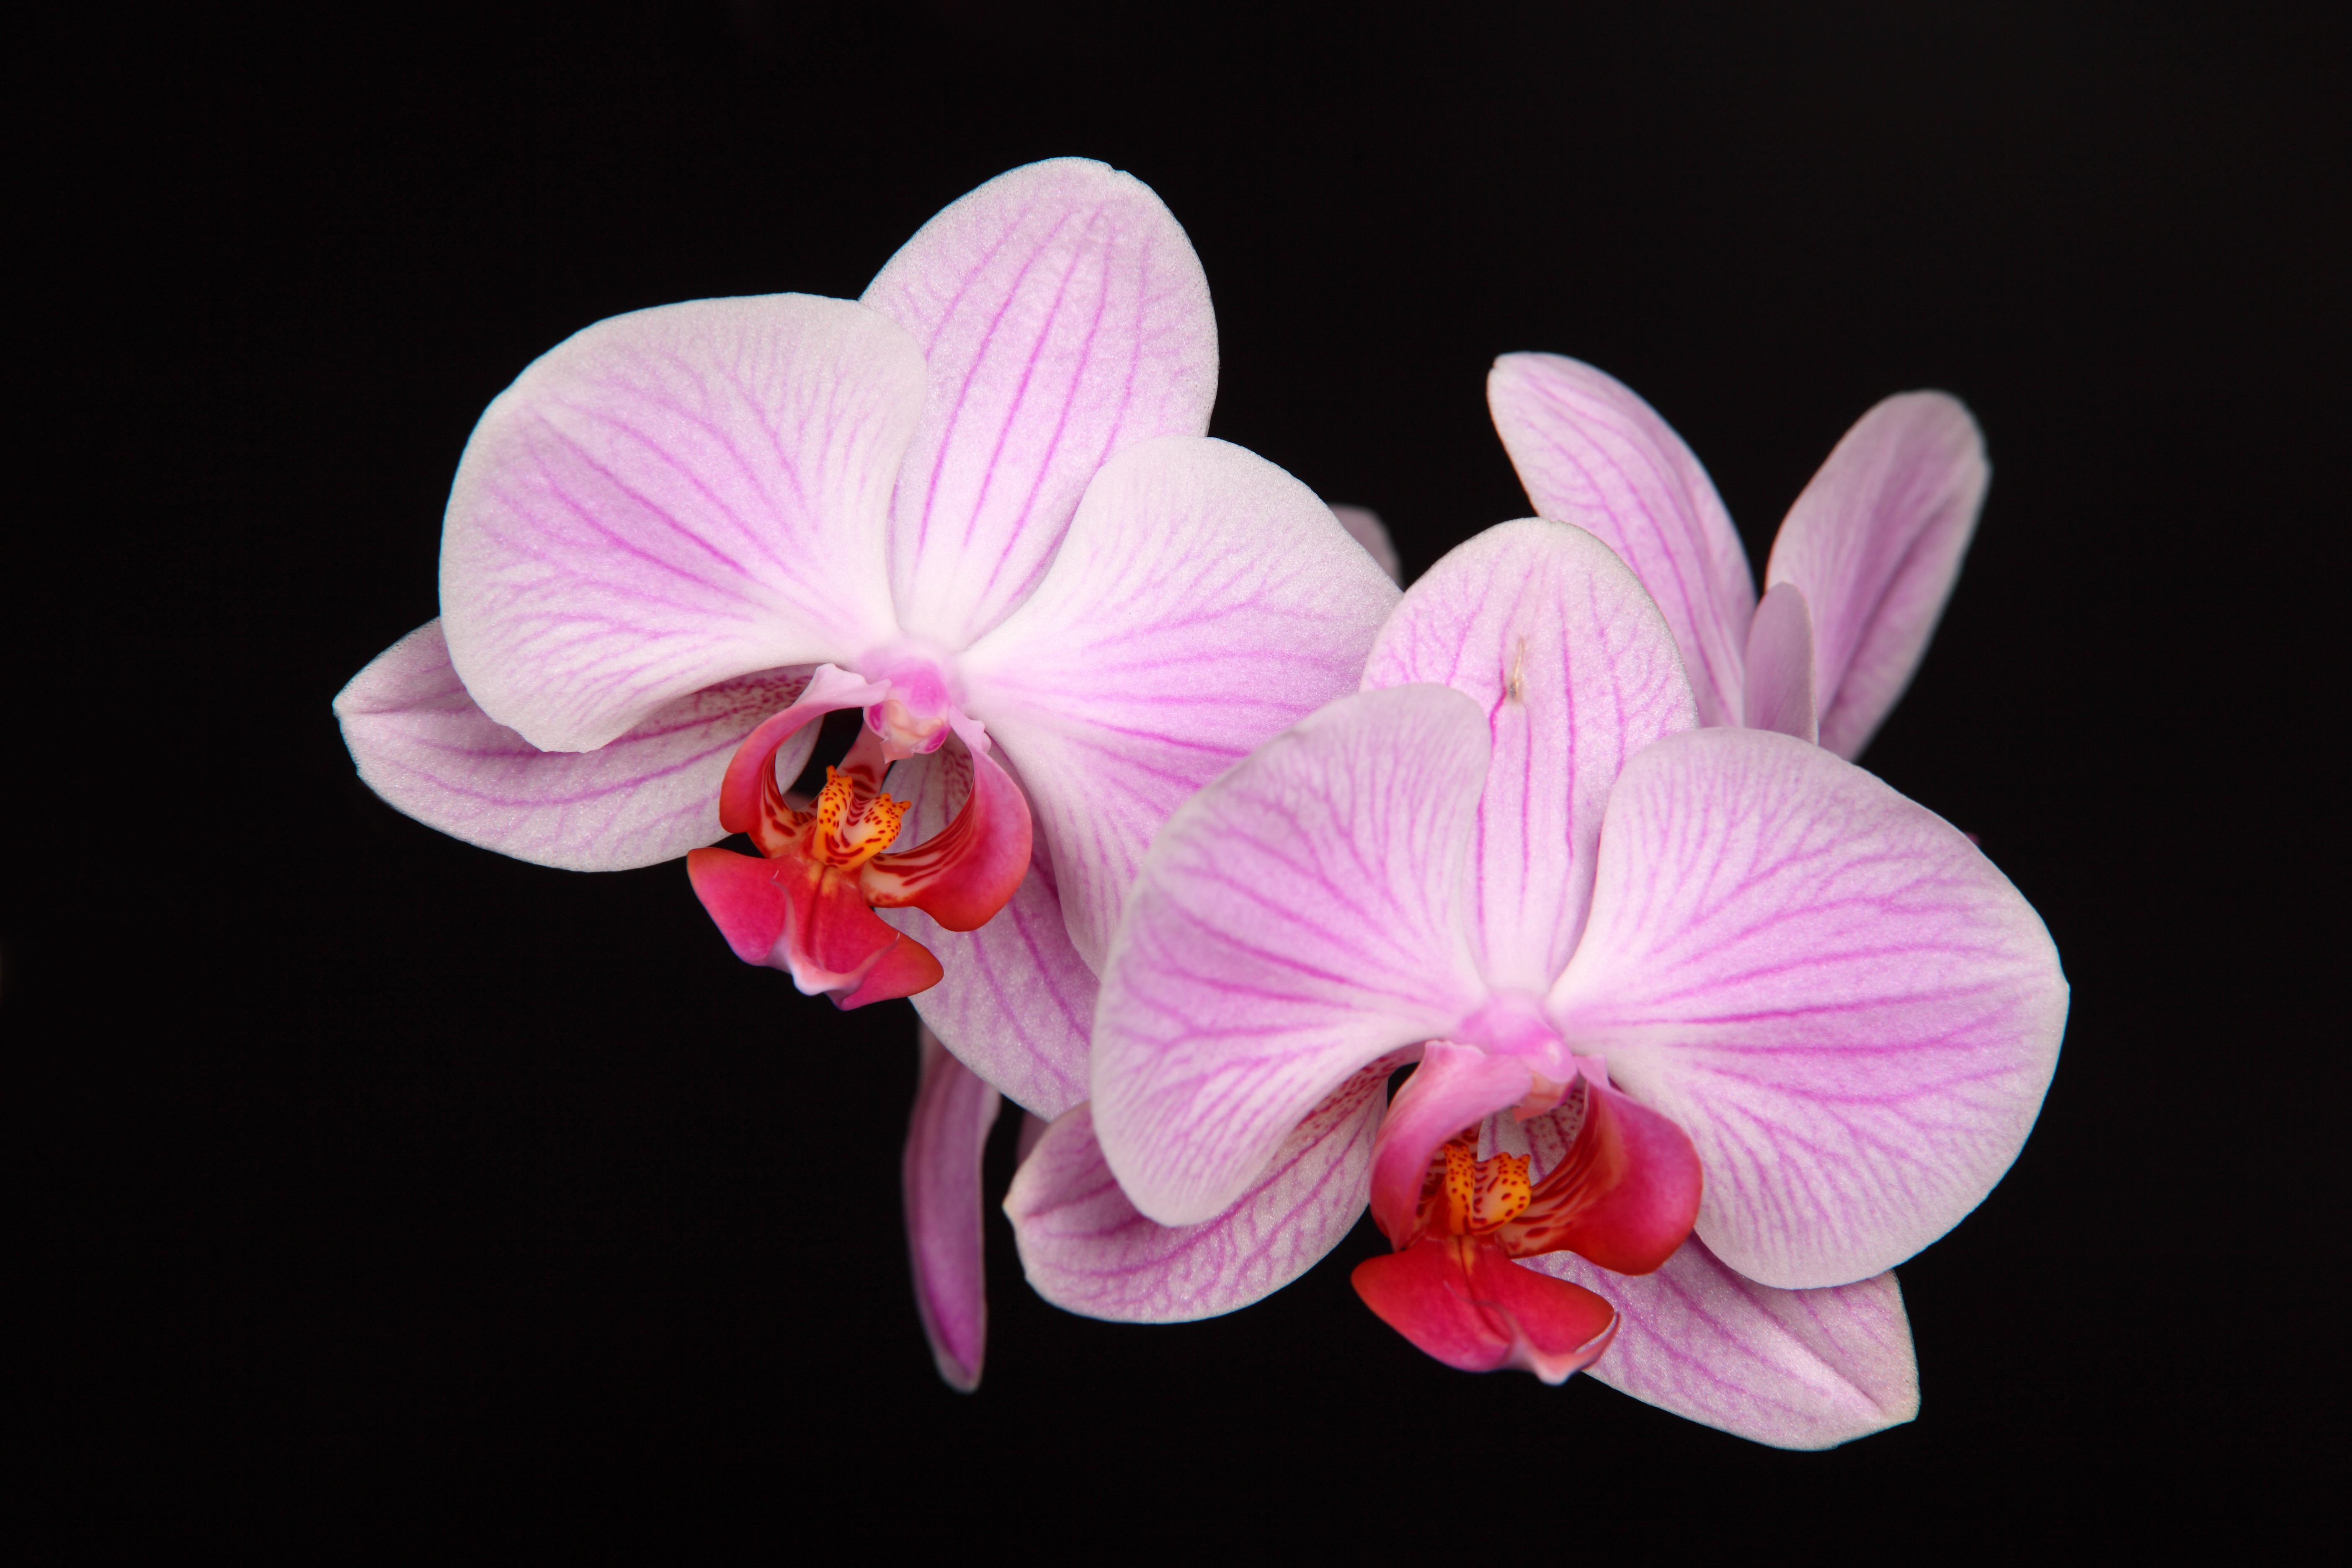 Shenzhen Nongke Orchid High Definition